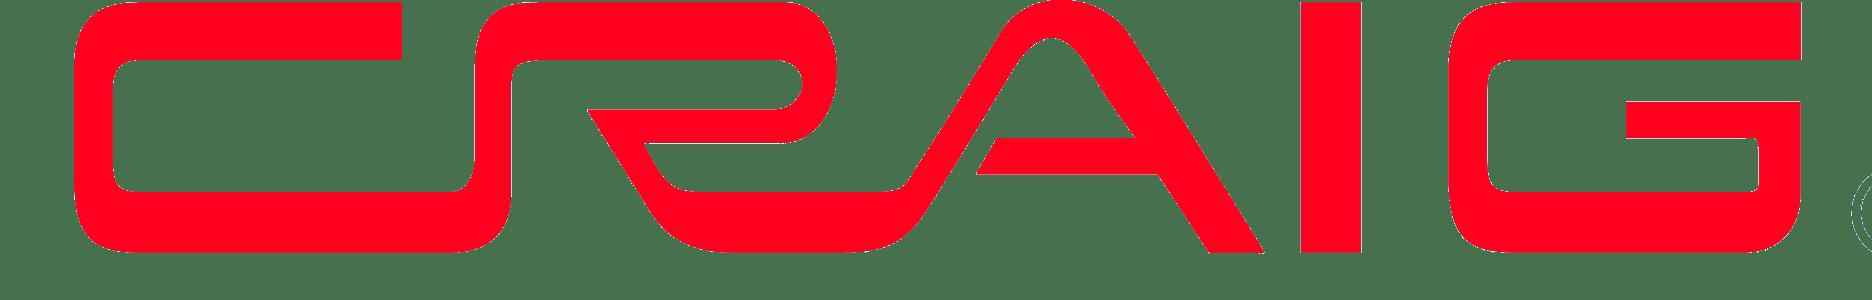 Craig Electronics company logo